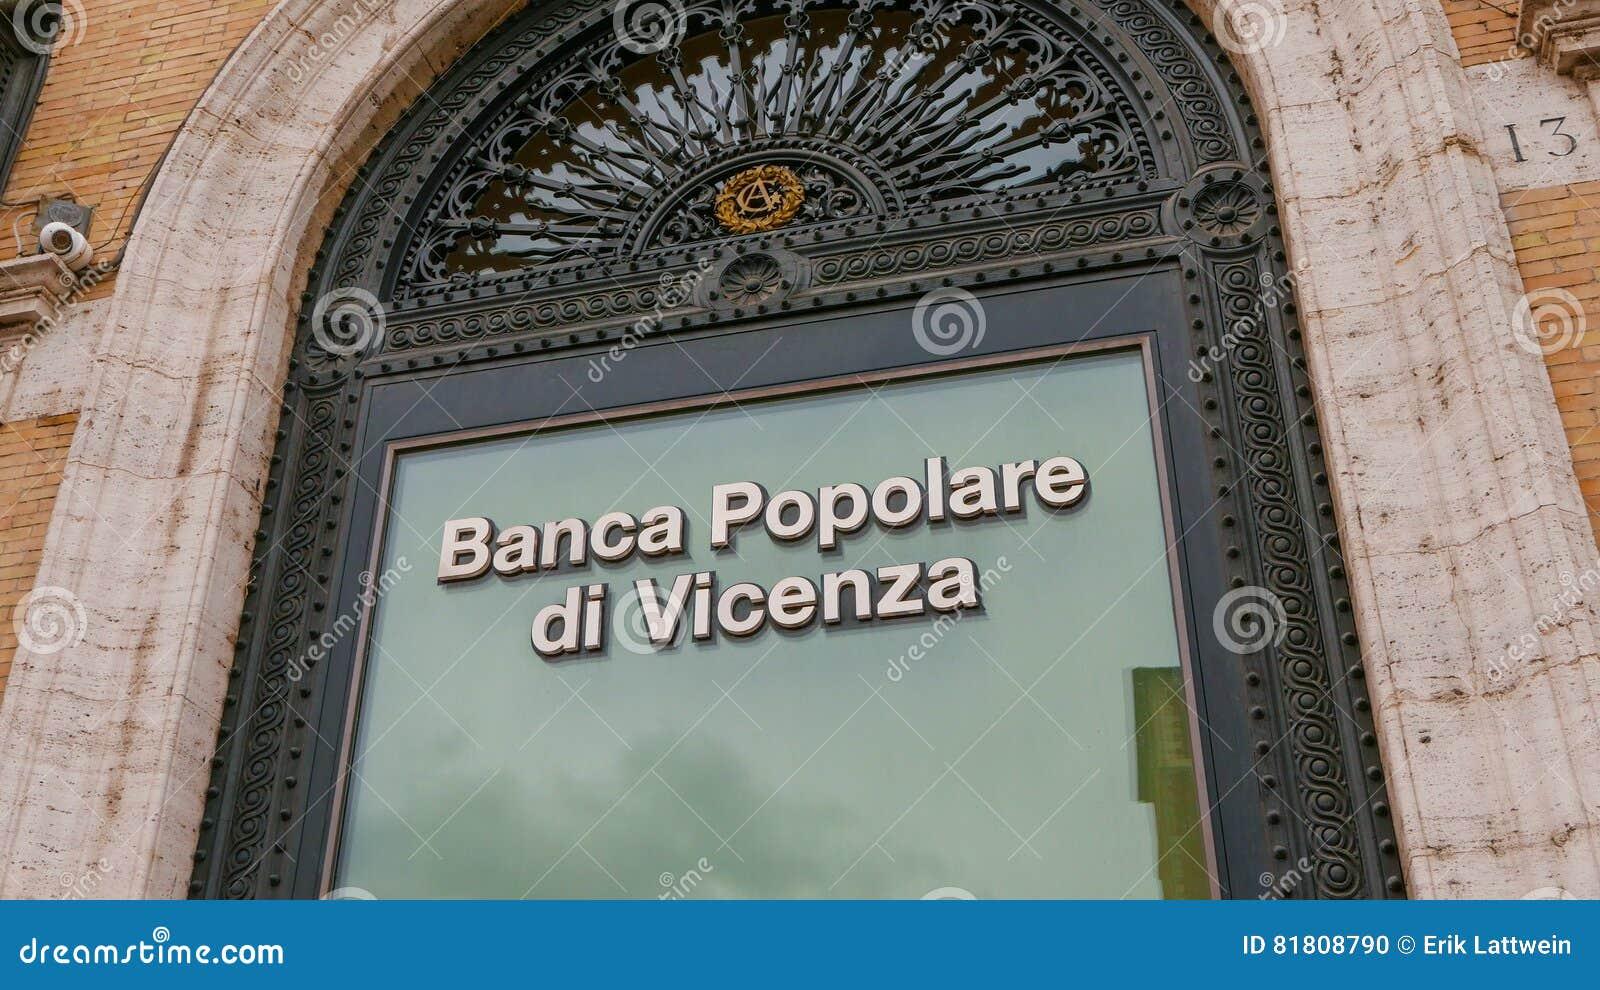 Здание банка в Риме - Banca Popolare di Vincenza